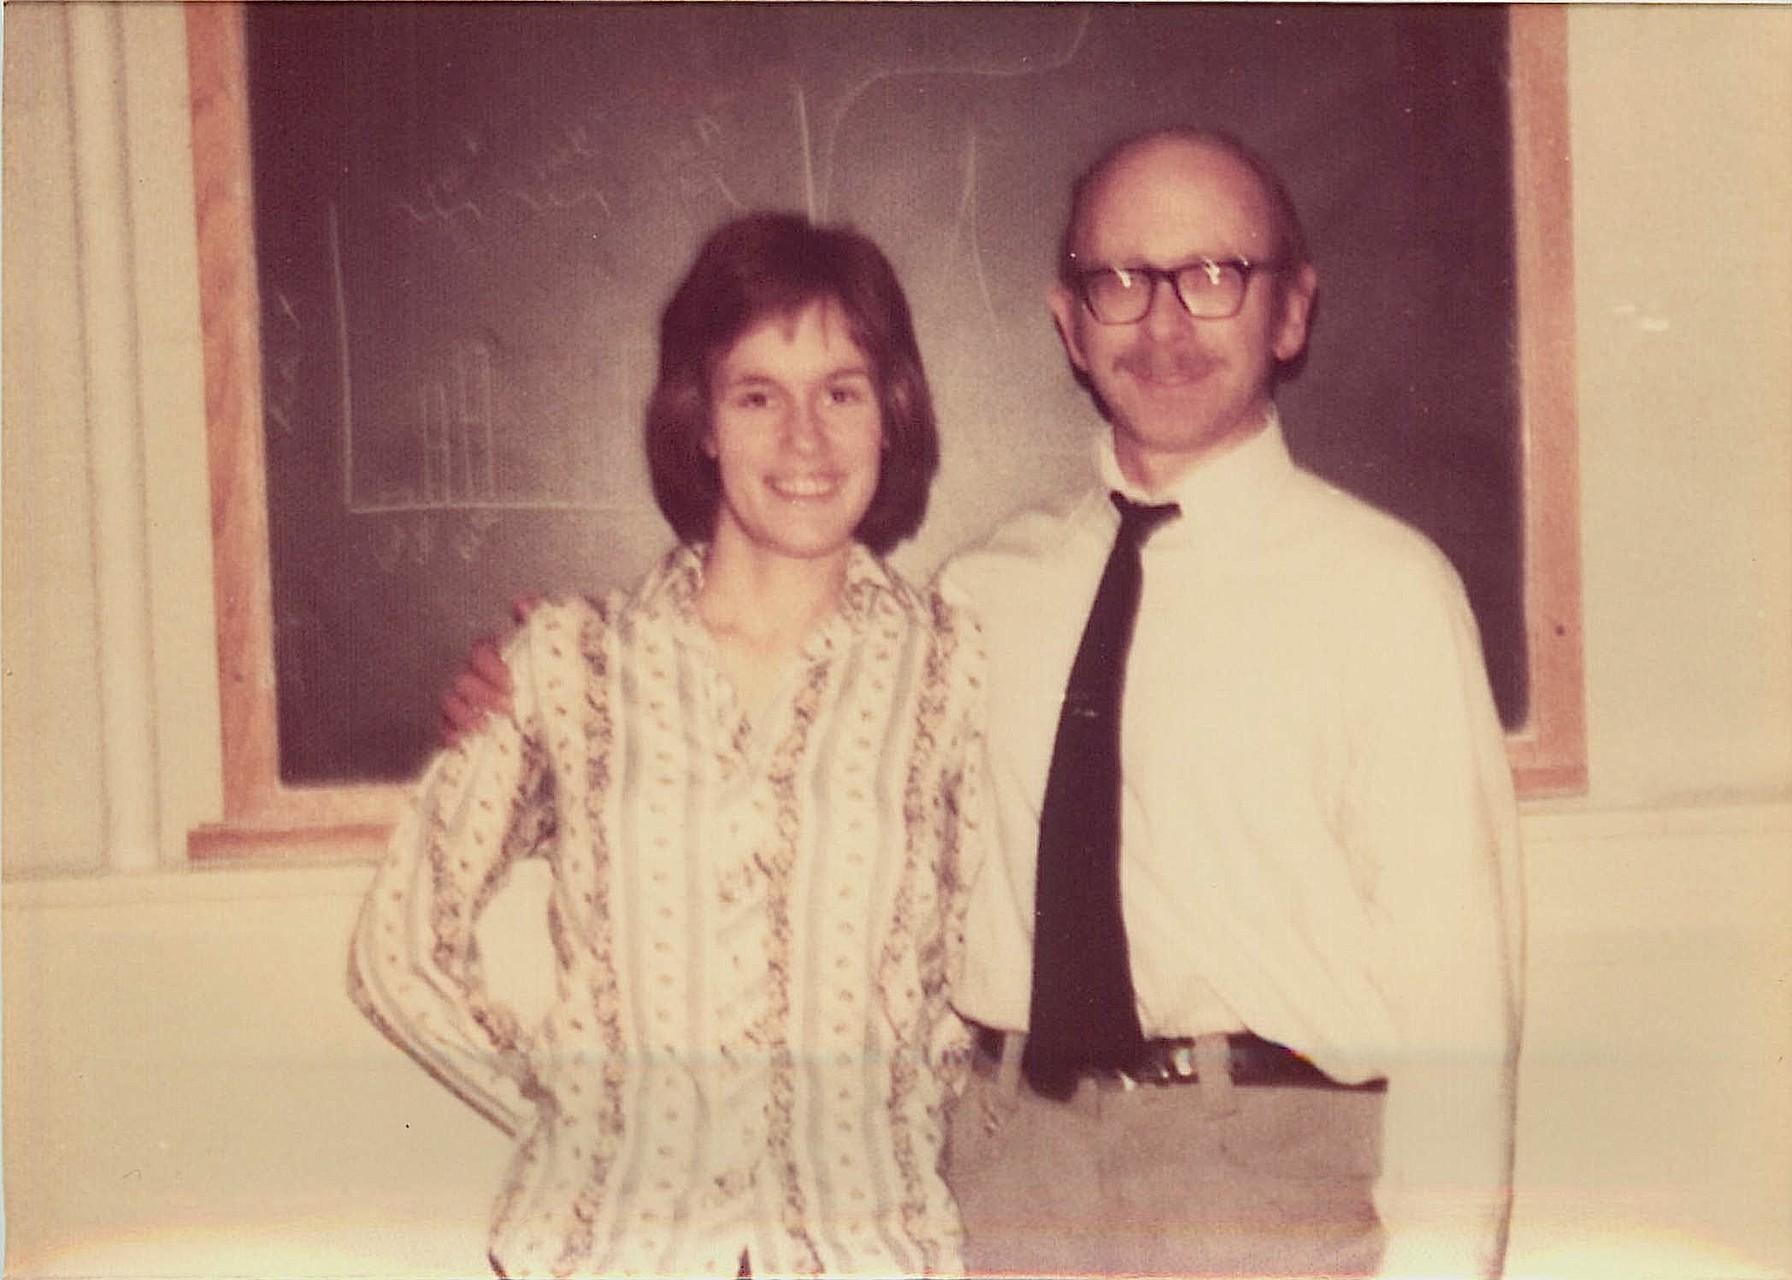 Lorraine Gudas & her mentor/advisor, Dr. Arthur Pardee, Princeton, 1975